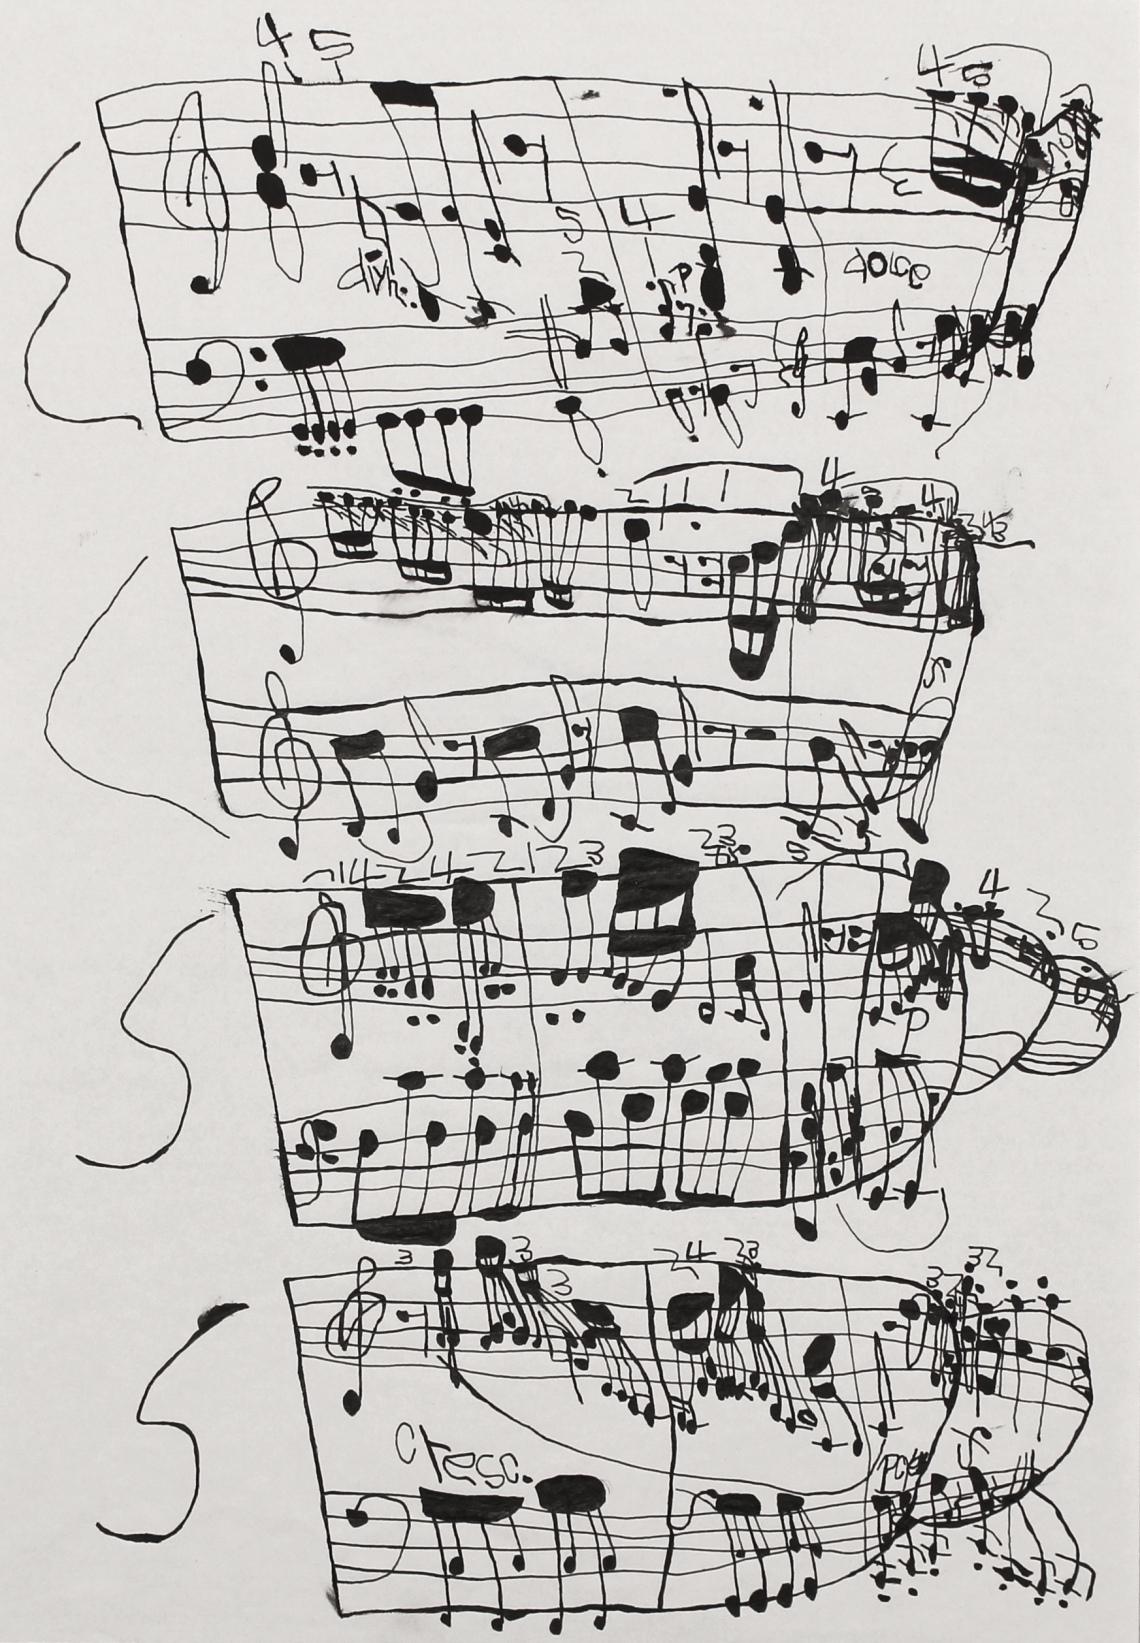 Koji Nishioka, Musical Score 9, 37 x 26 cm, Ink on paper